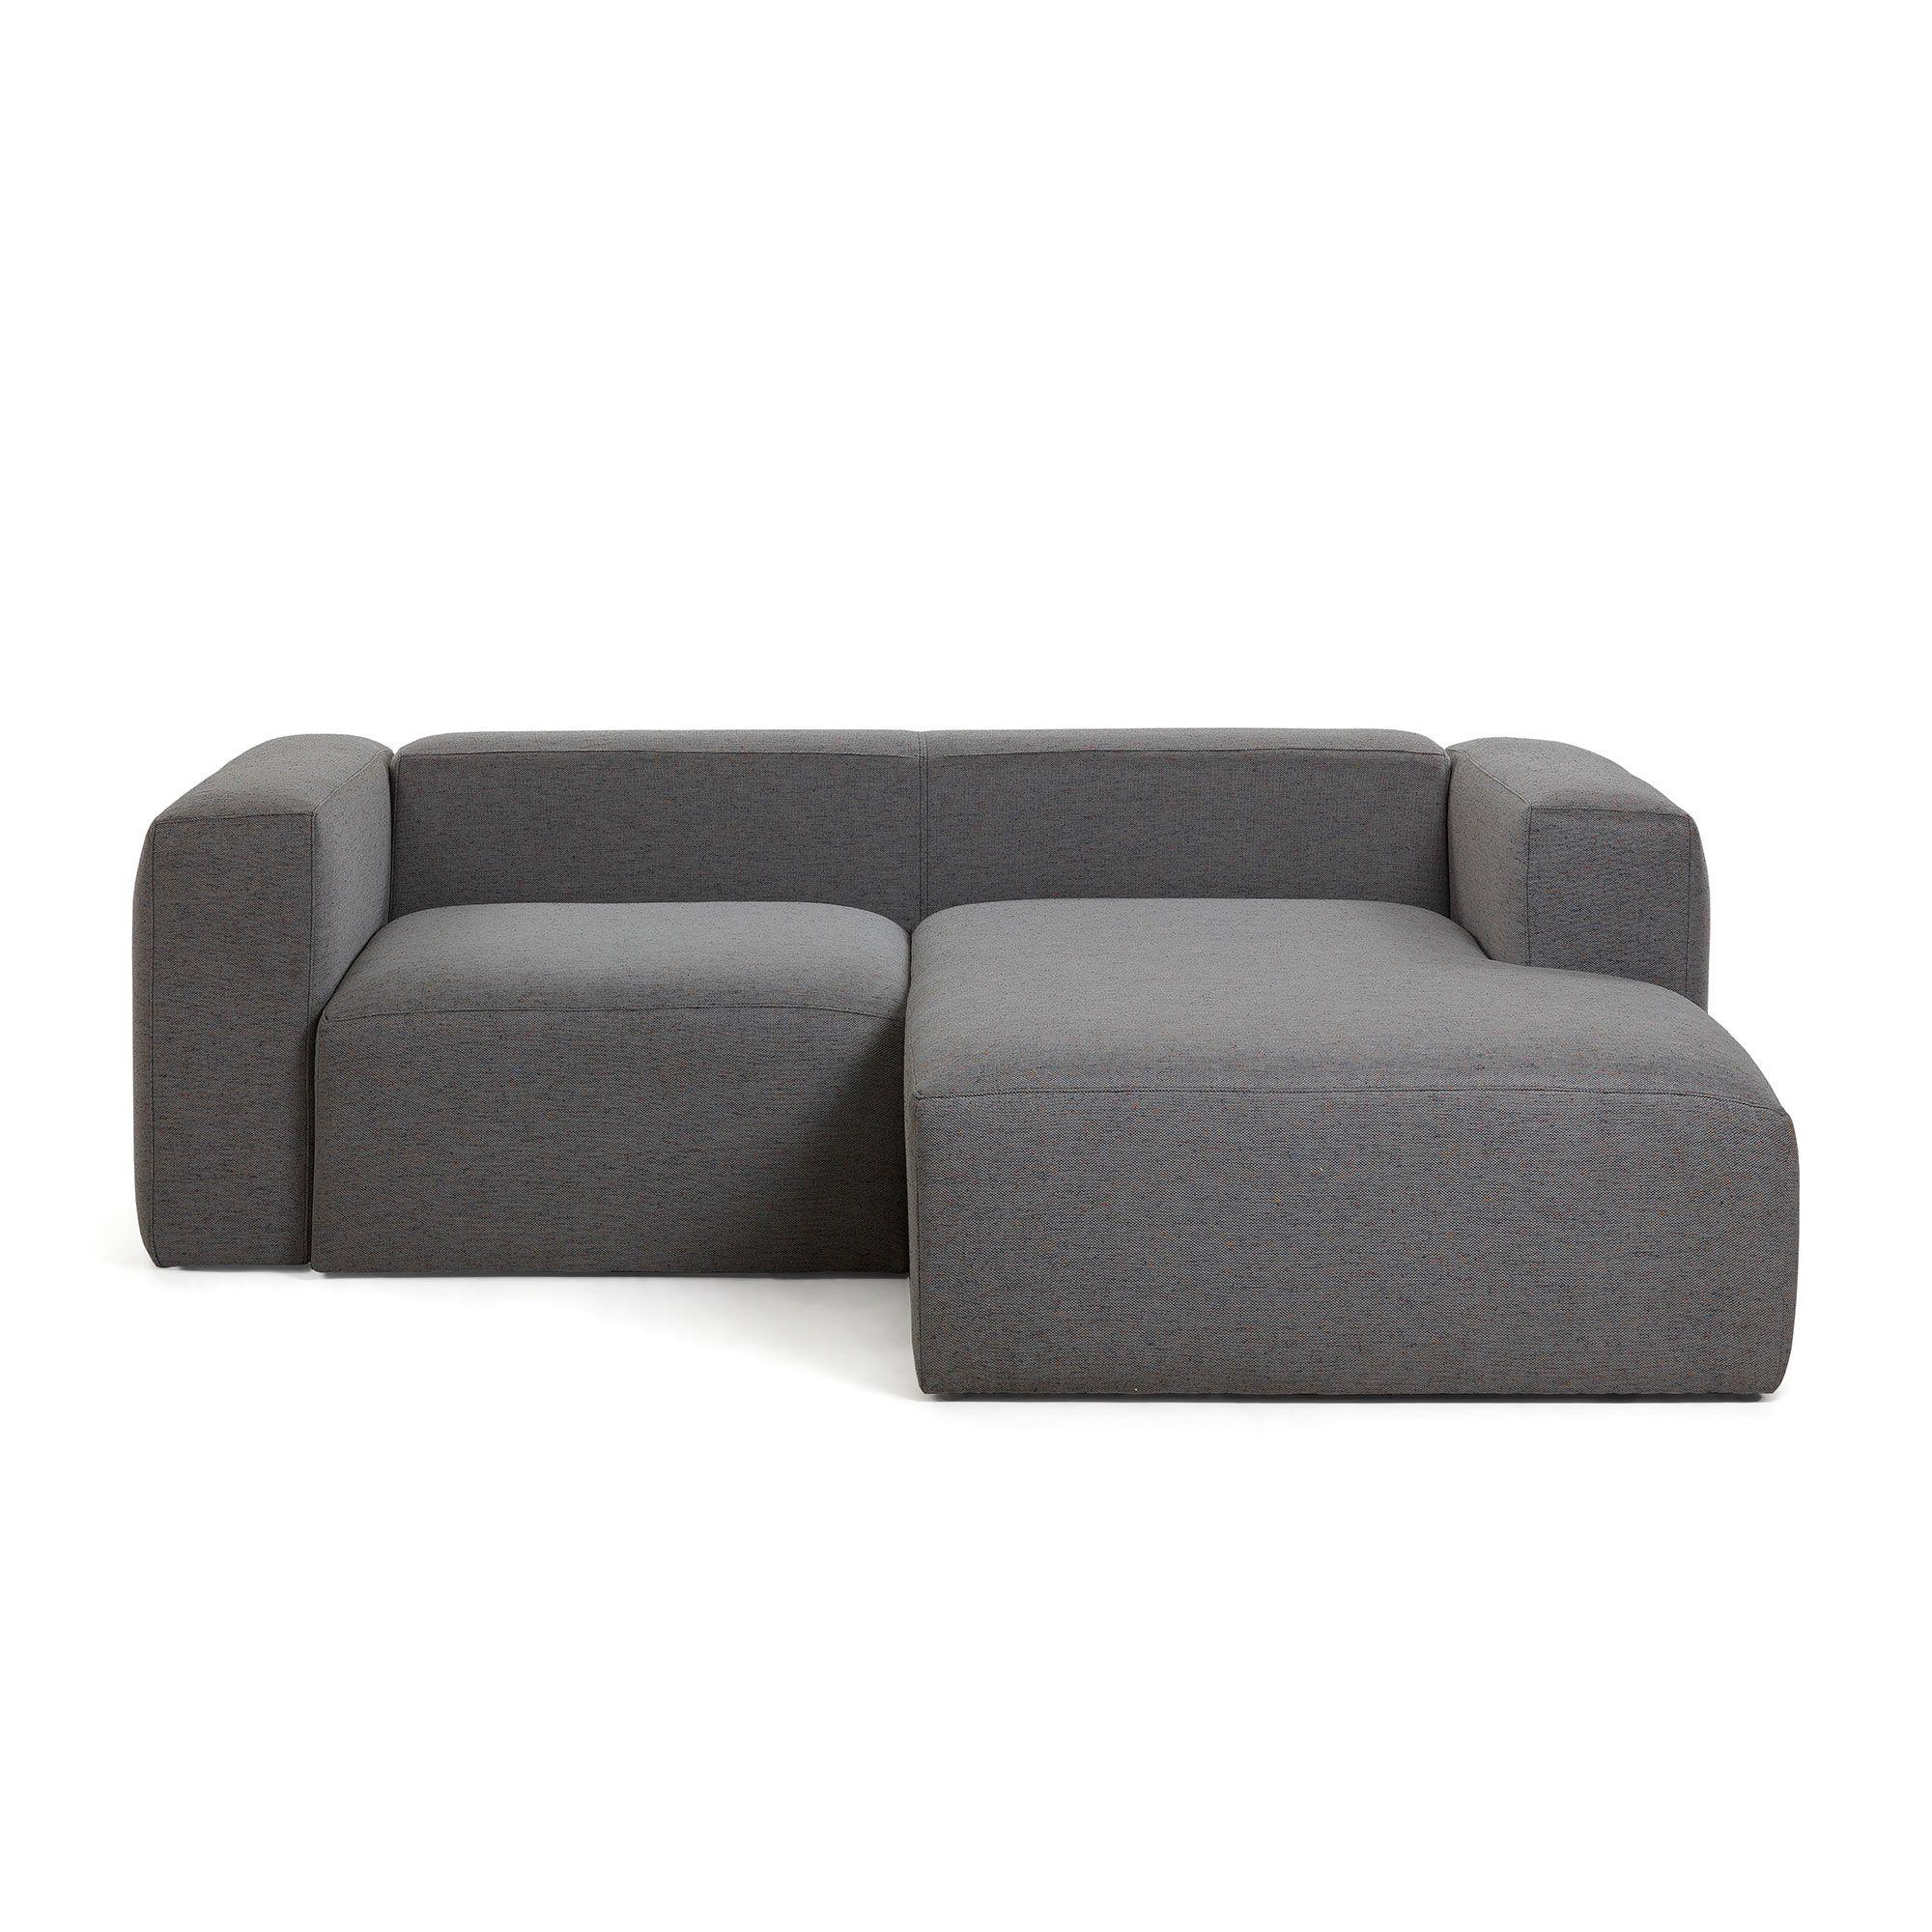 Sofá Blok chaise longue derecho 2 plazas gris oscuro